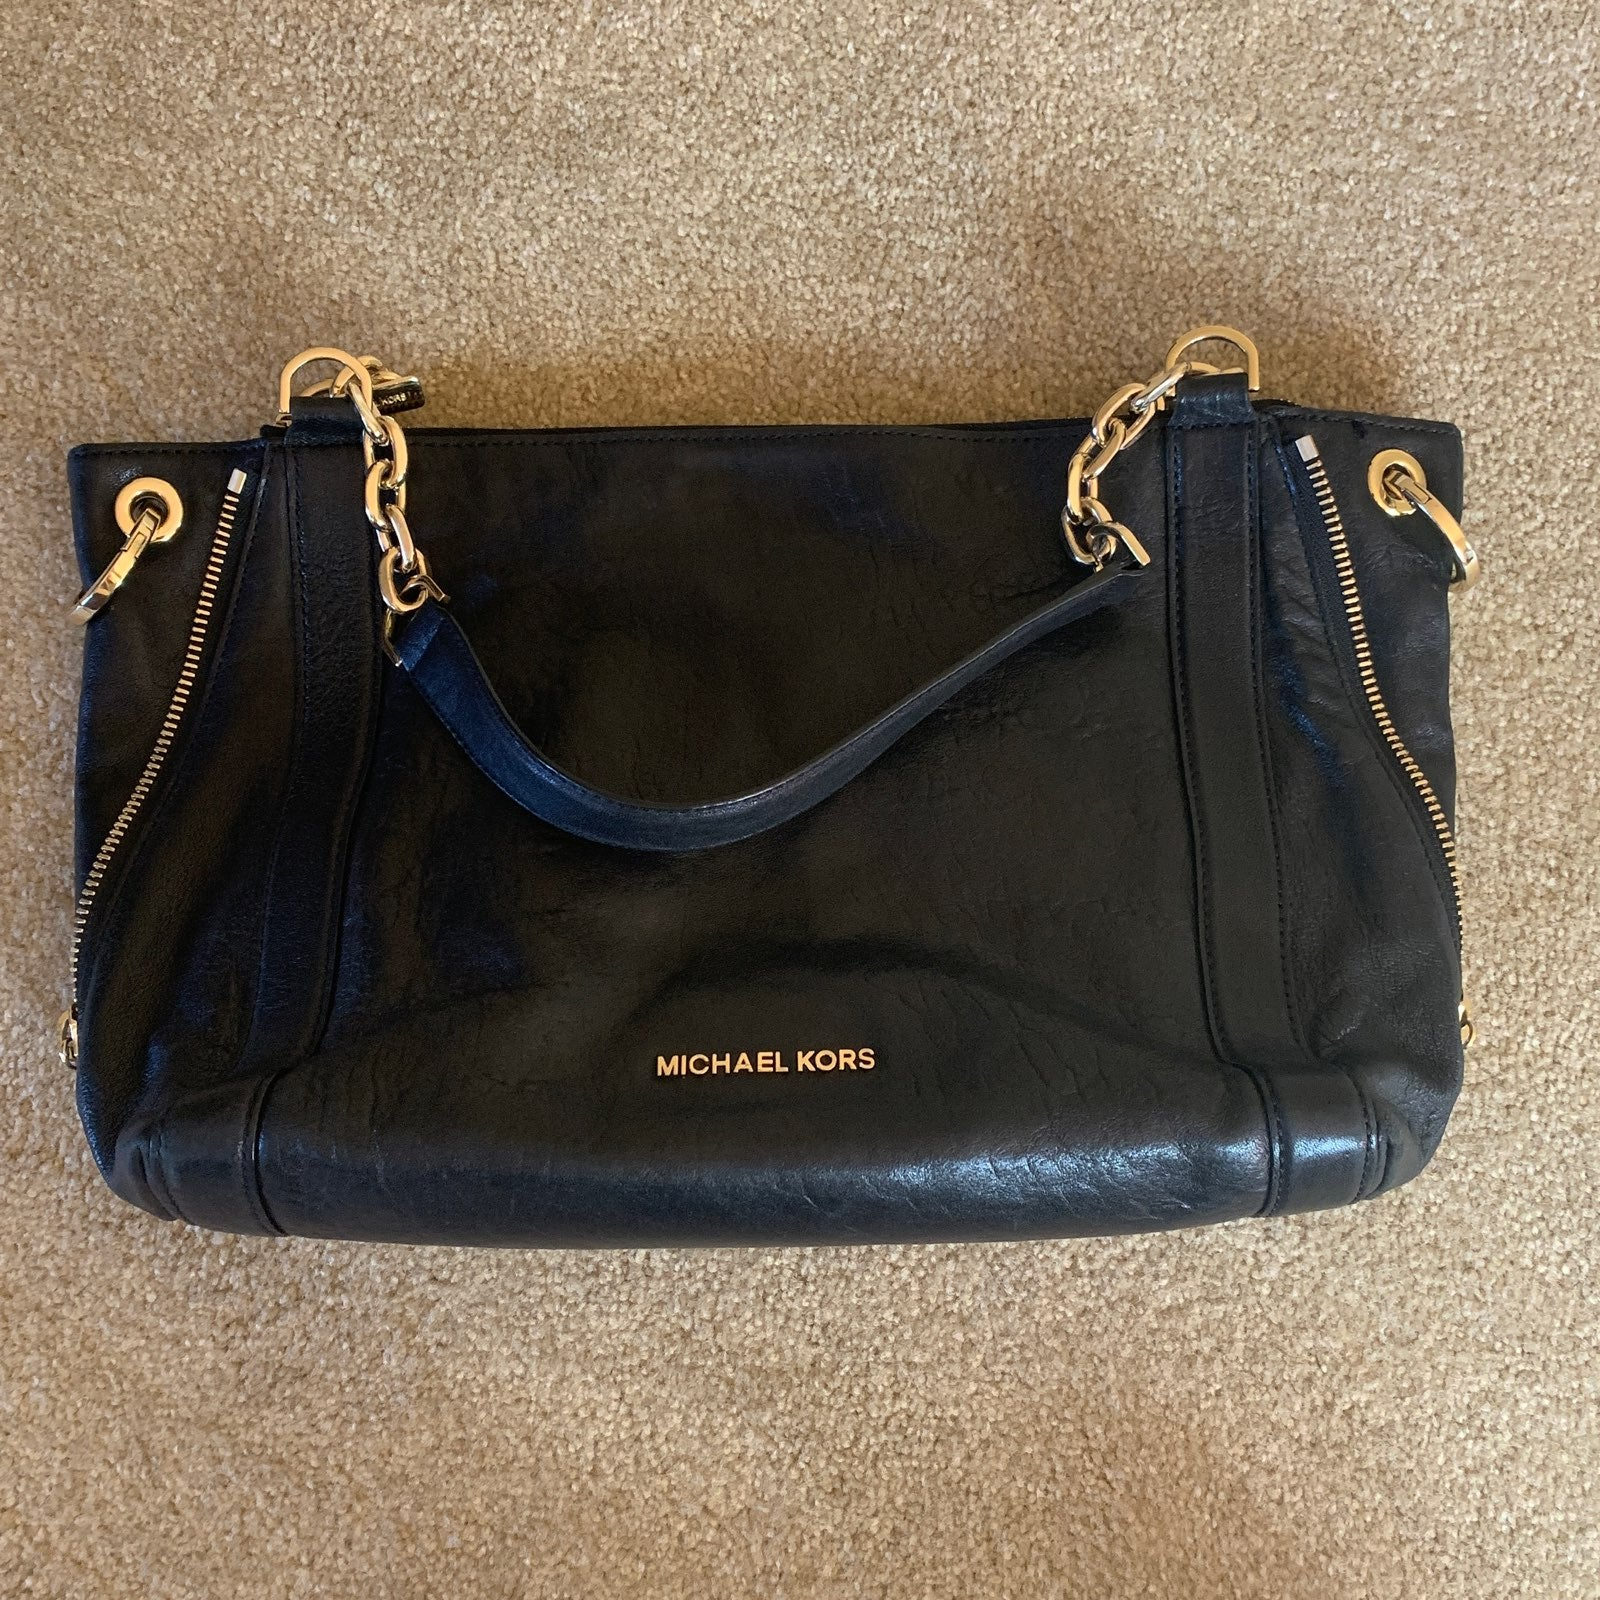 Michael Kors Black Stanthorpe Handbag